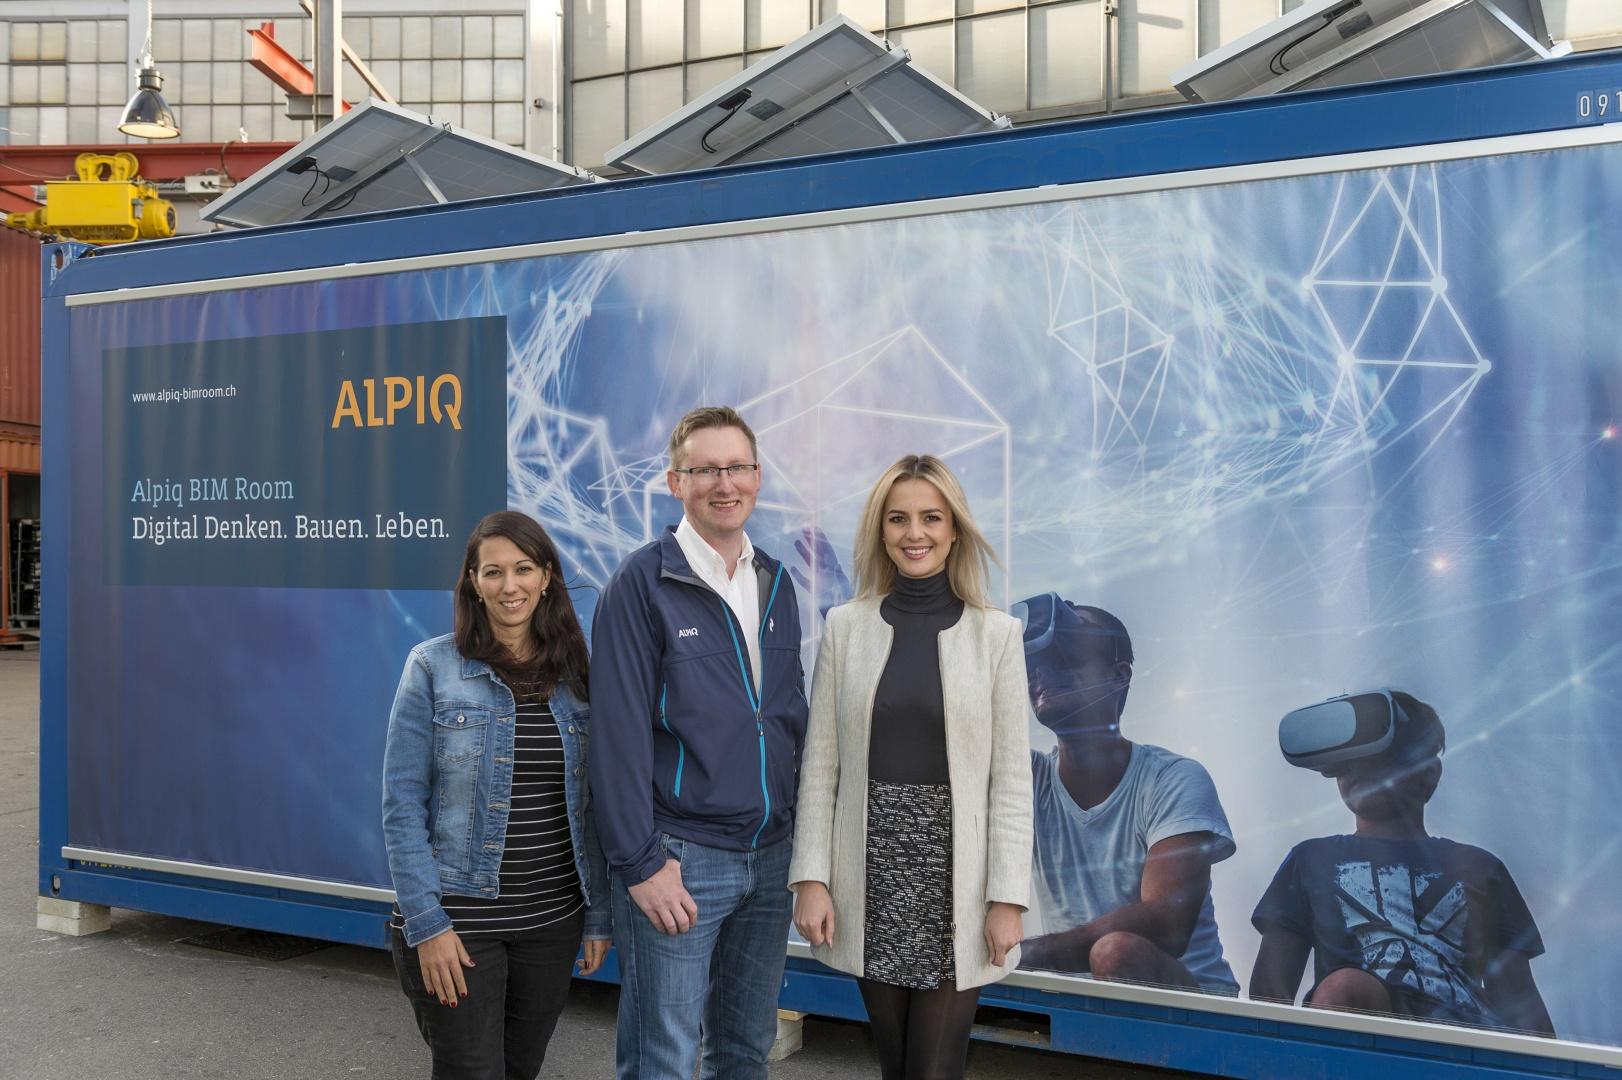 Lead Projektteam (v.l.n.r. Viviana Angelico, Stefan Wüst, Egzona Aliji) © Alpiq InTec Schweiz AG, Webereiweg 6, 4802 Strengelbach